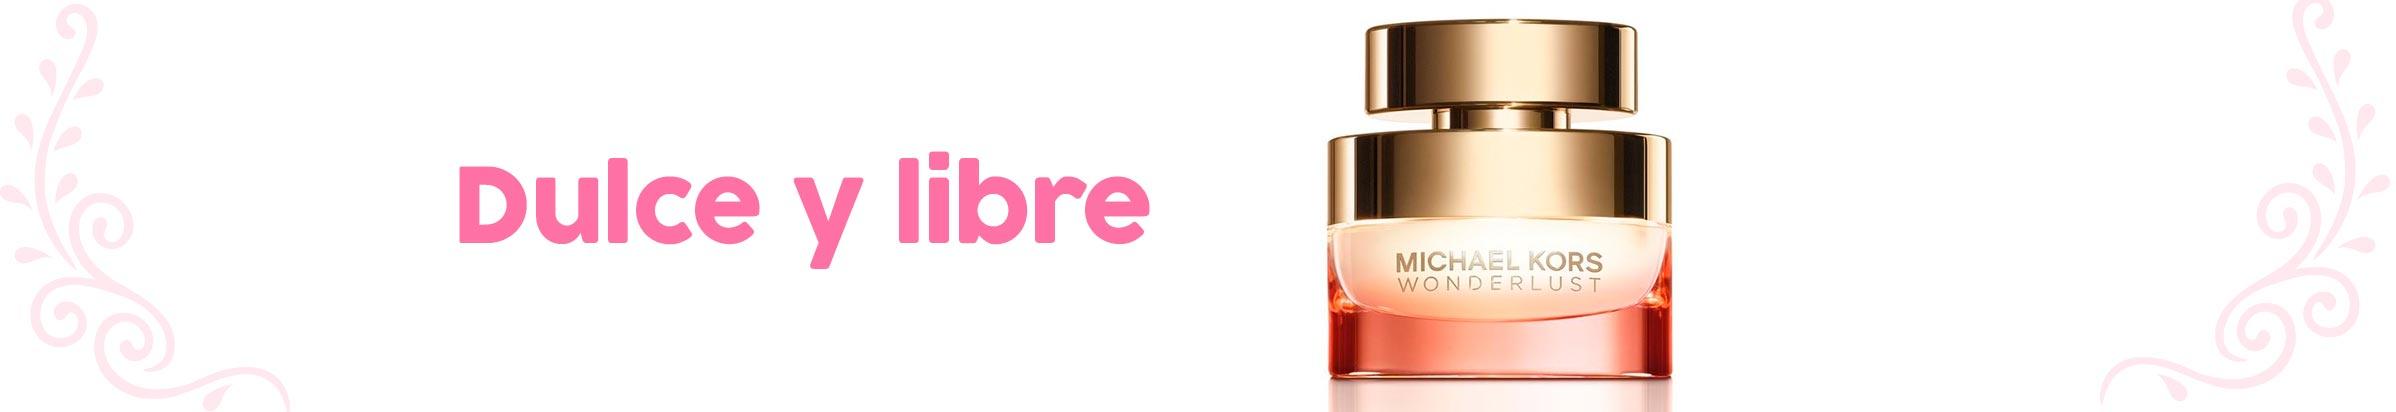 Blog-Img-Perfumes2